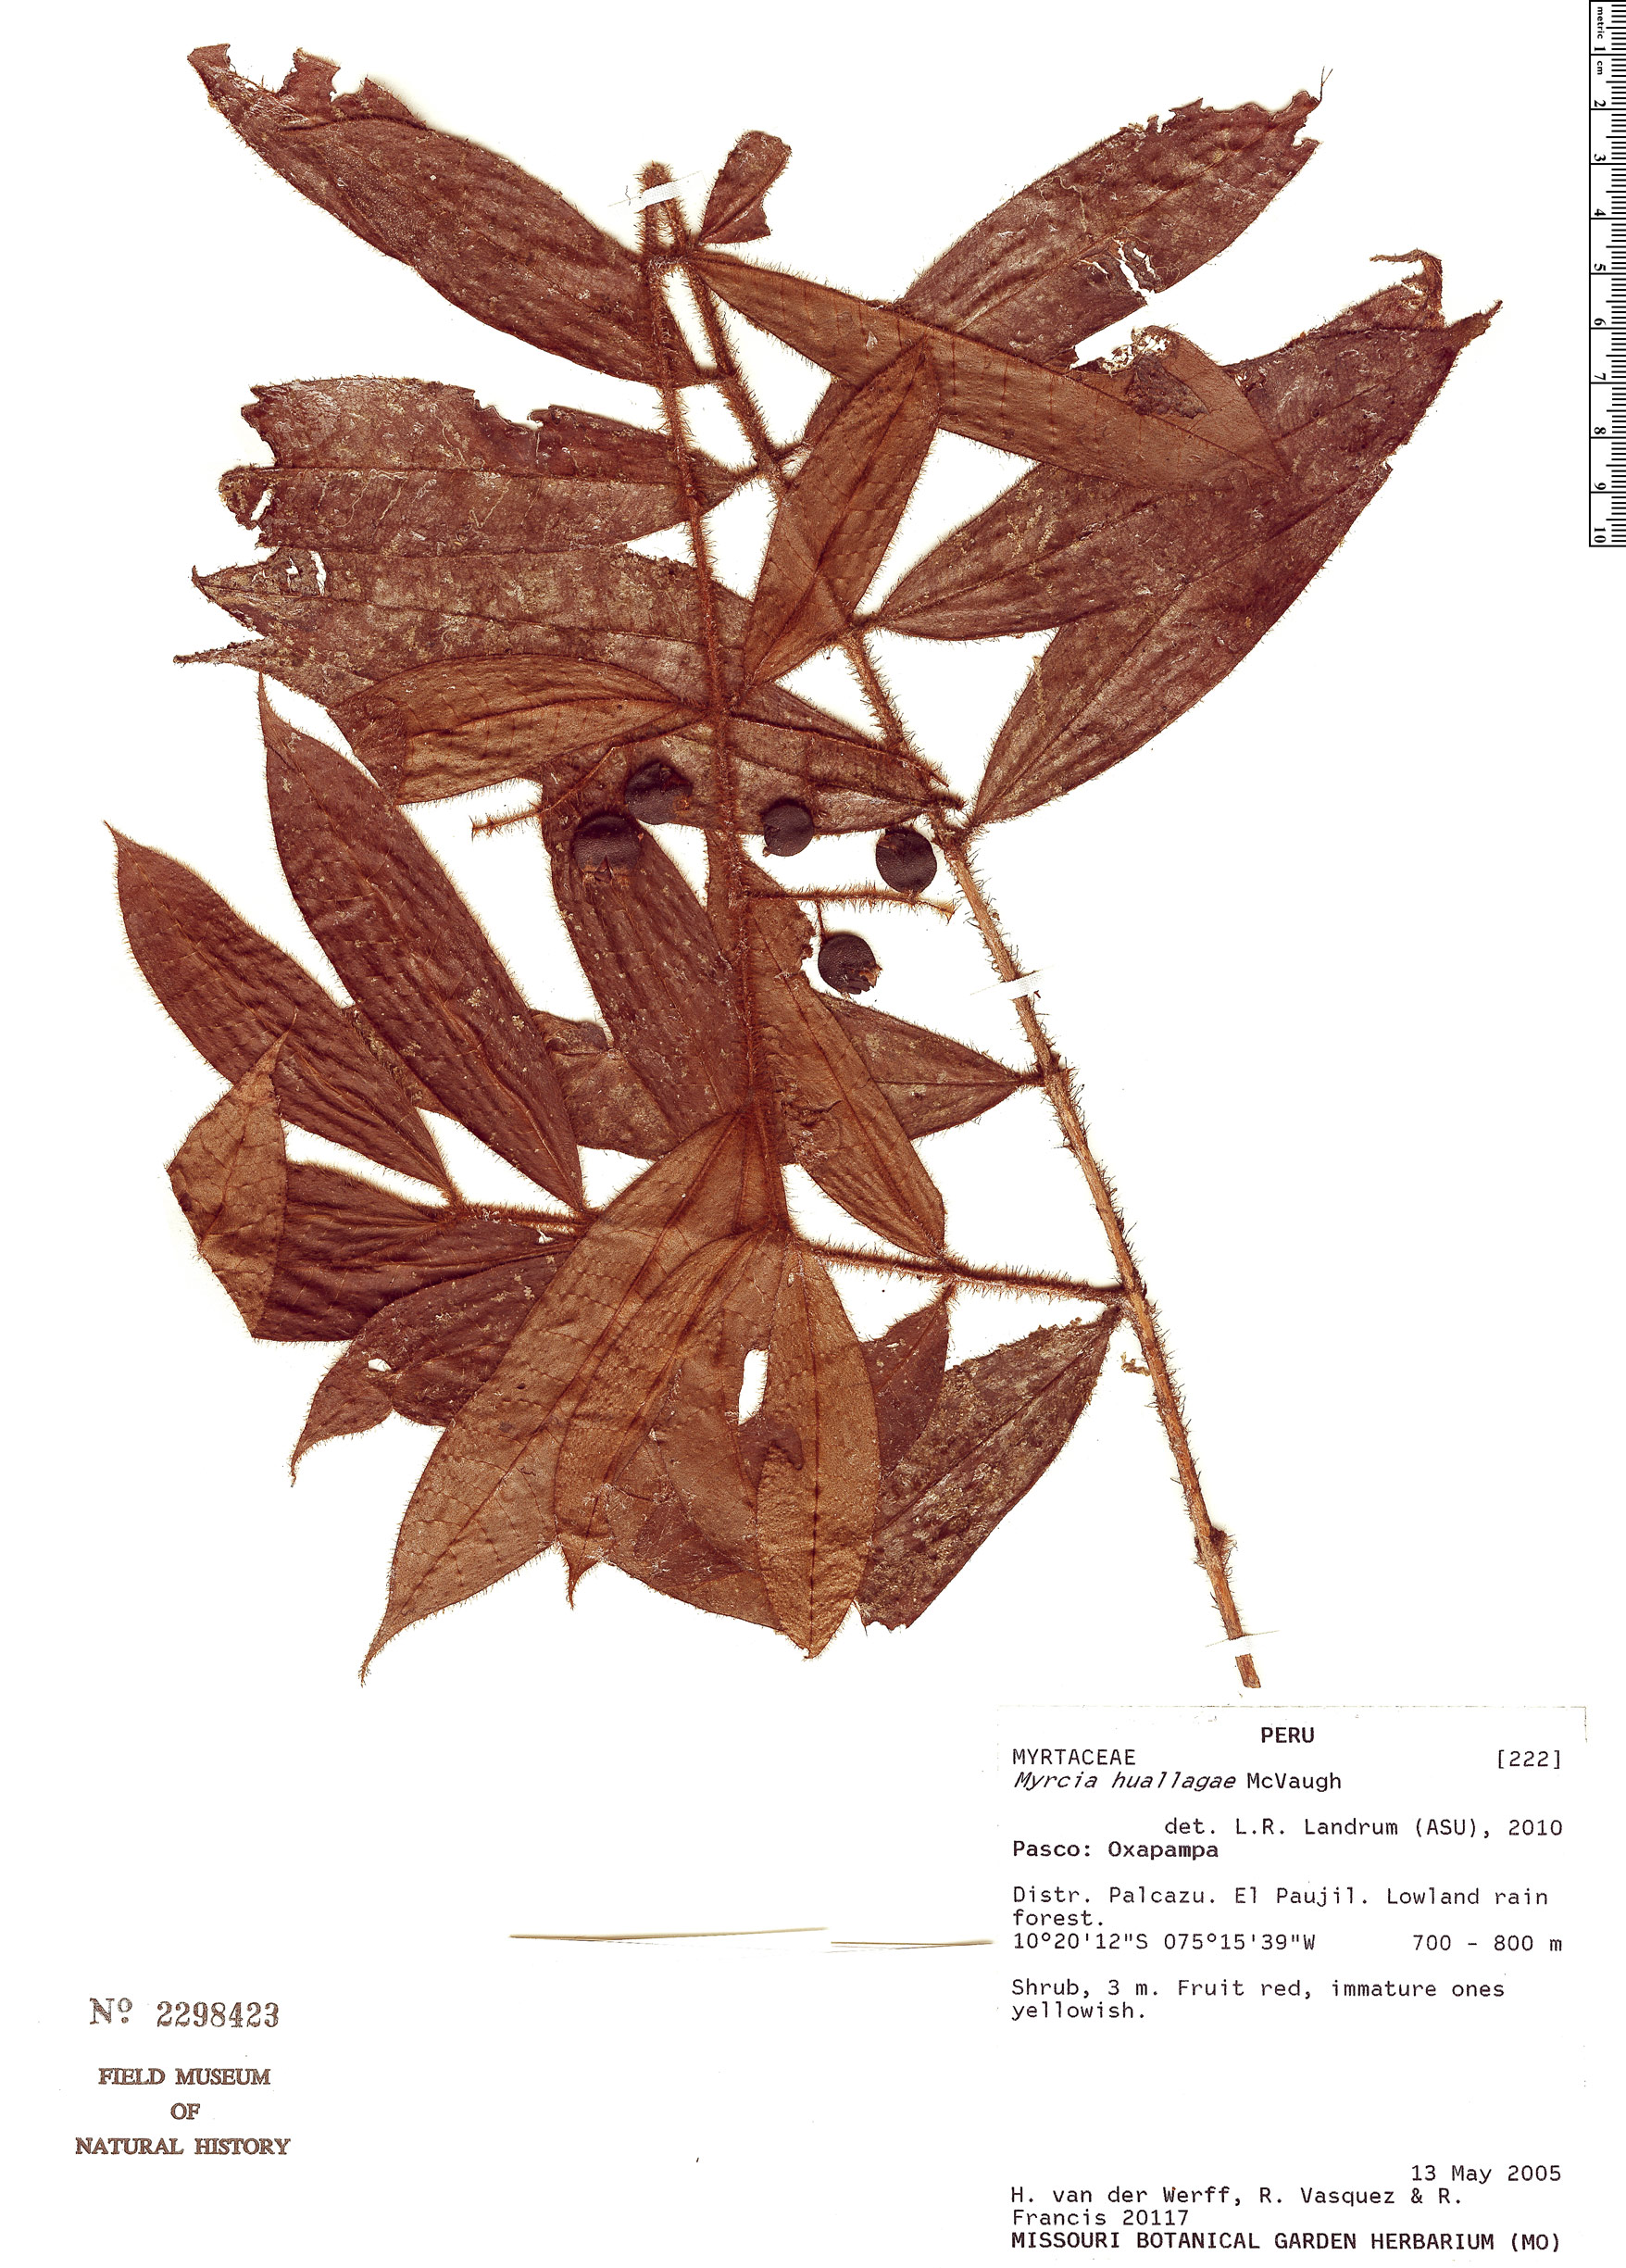 Specimen: Myrcia huallagae